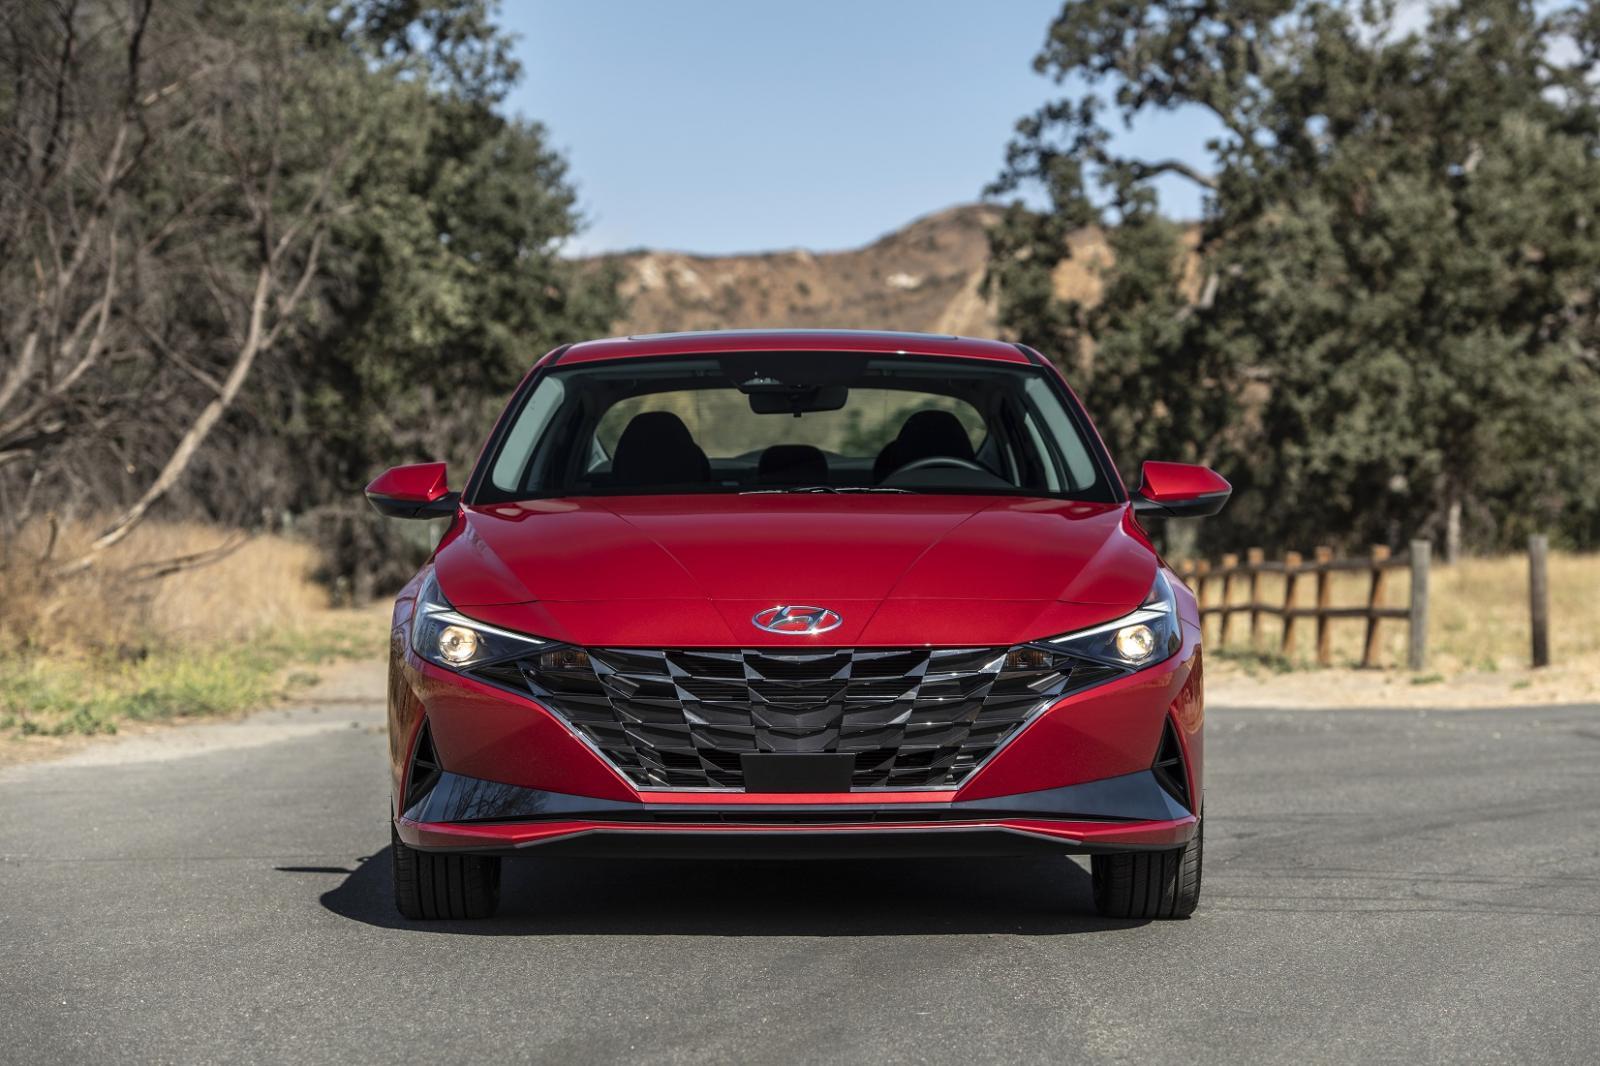 Hyundai Elantra 2022